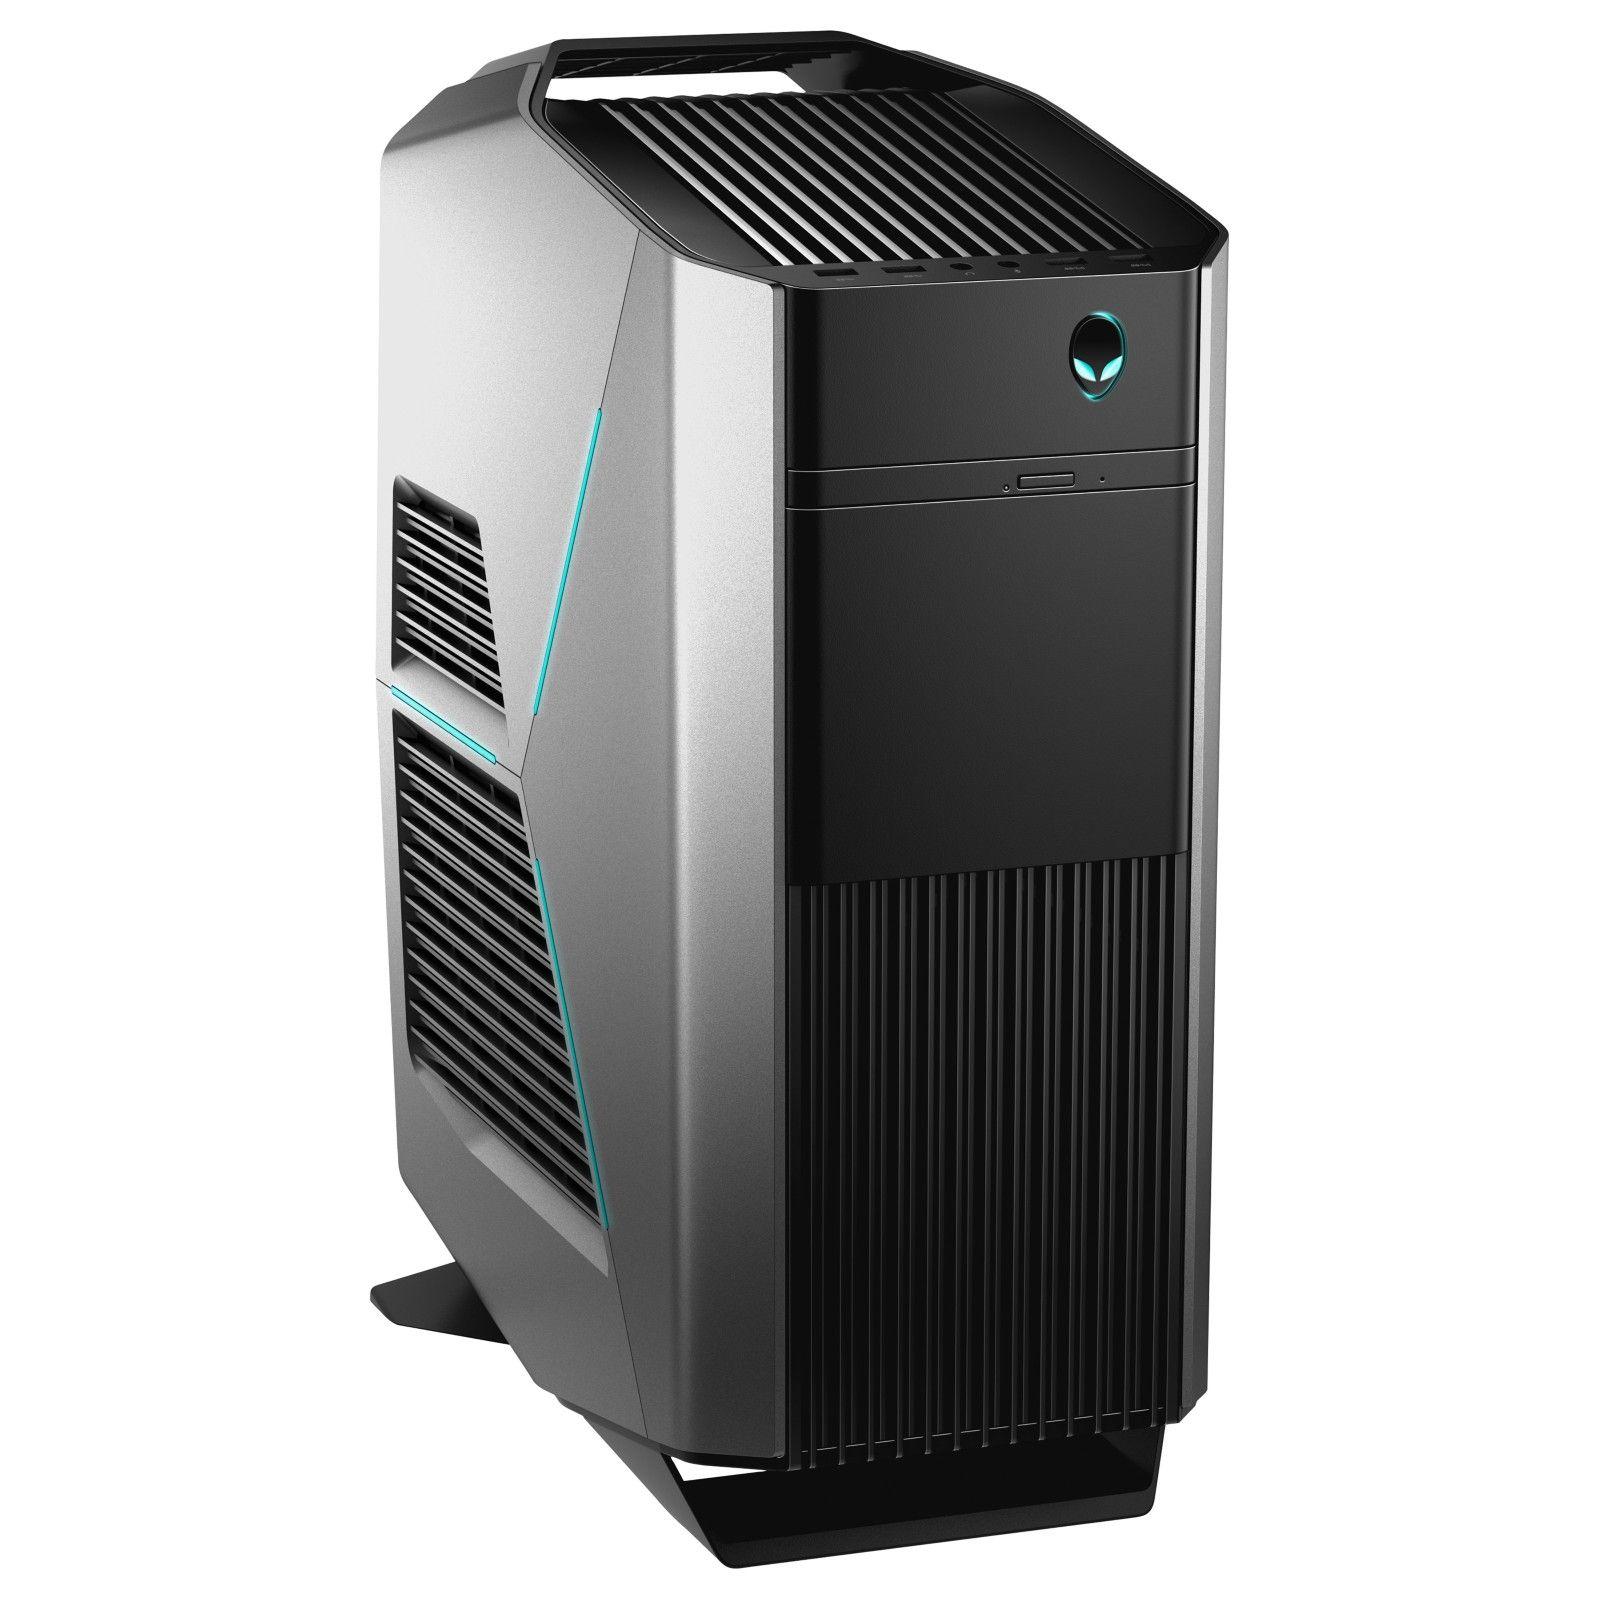 Alienware Aurora Desktop PC, Intel Core I7, 16GB RAM, 2TB